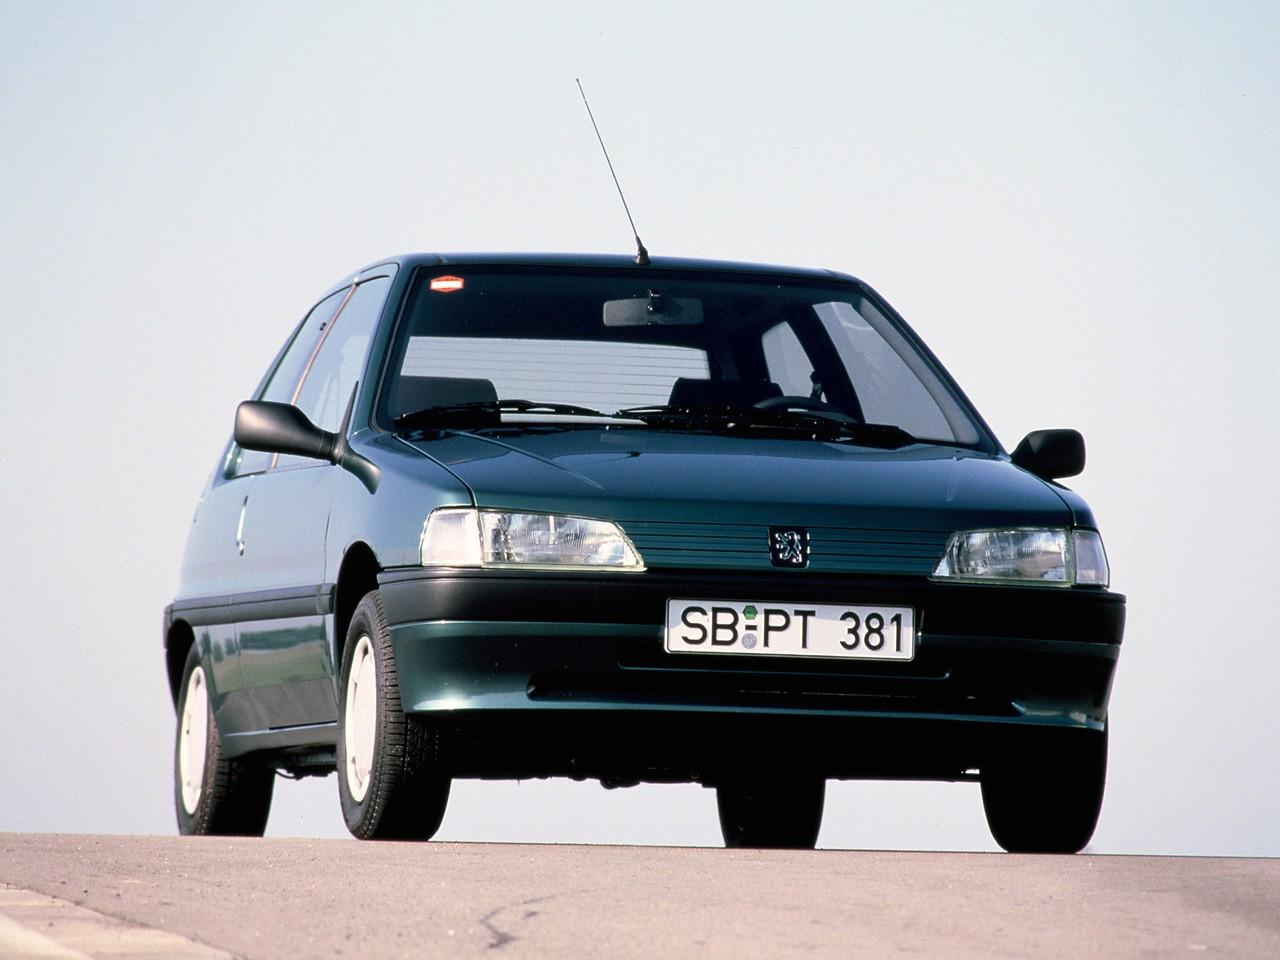 1991, 1992, 1993, 1994, 1995, 1996